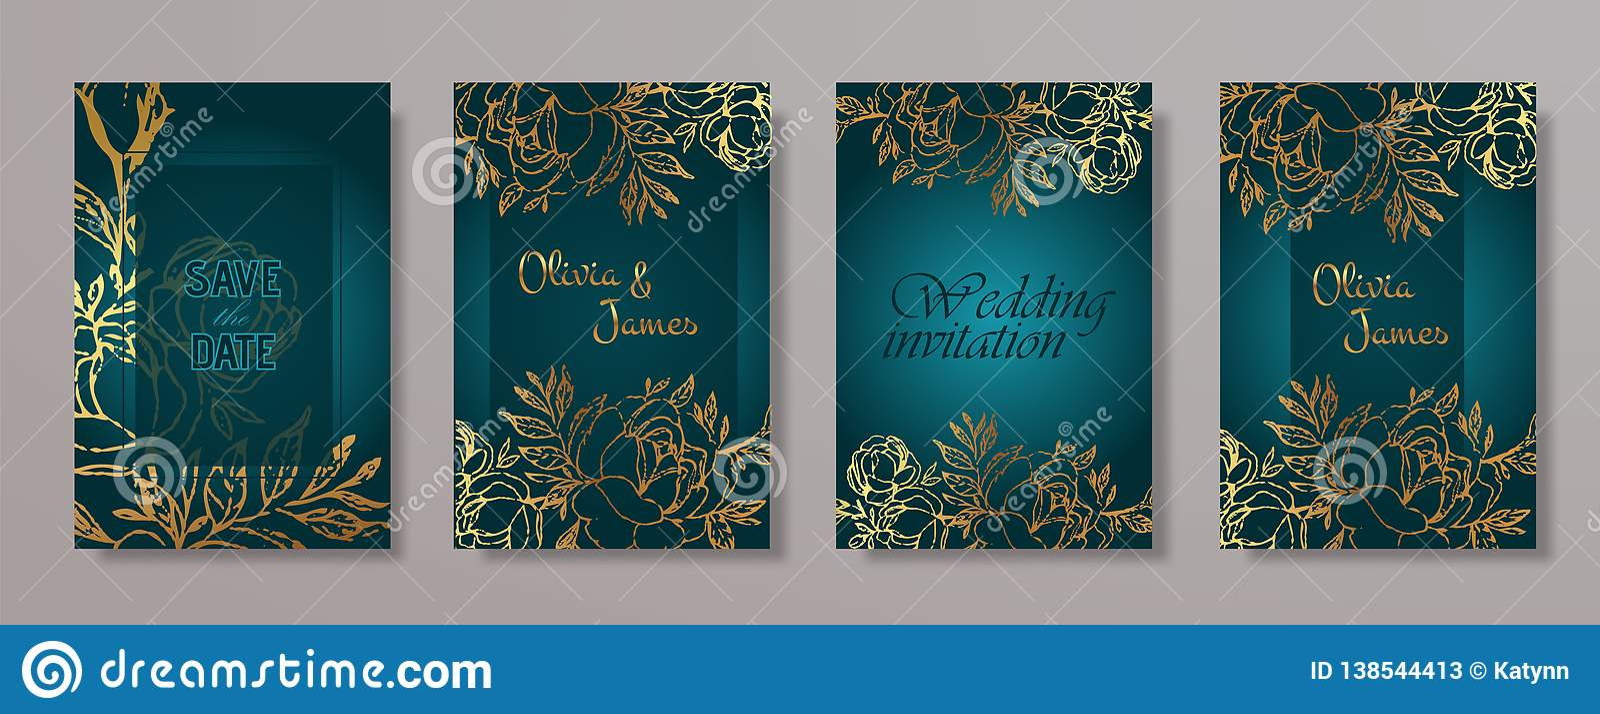 Wedding Invitation Card Vector Template For Wedding